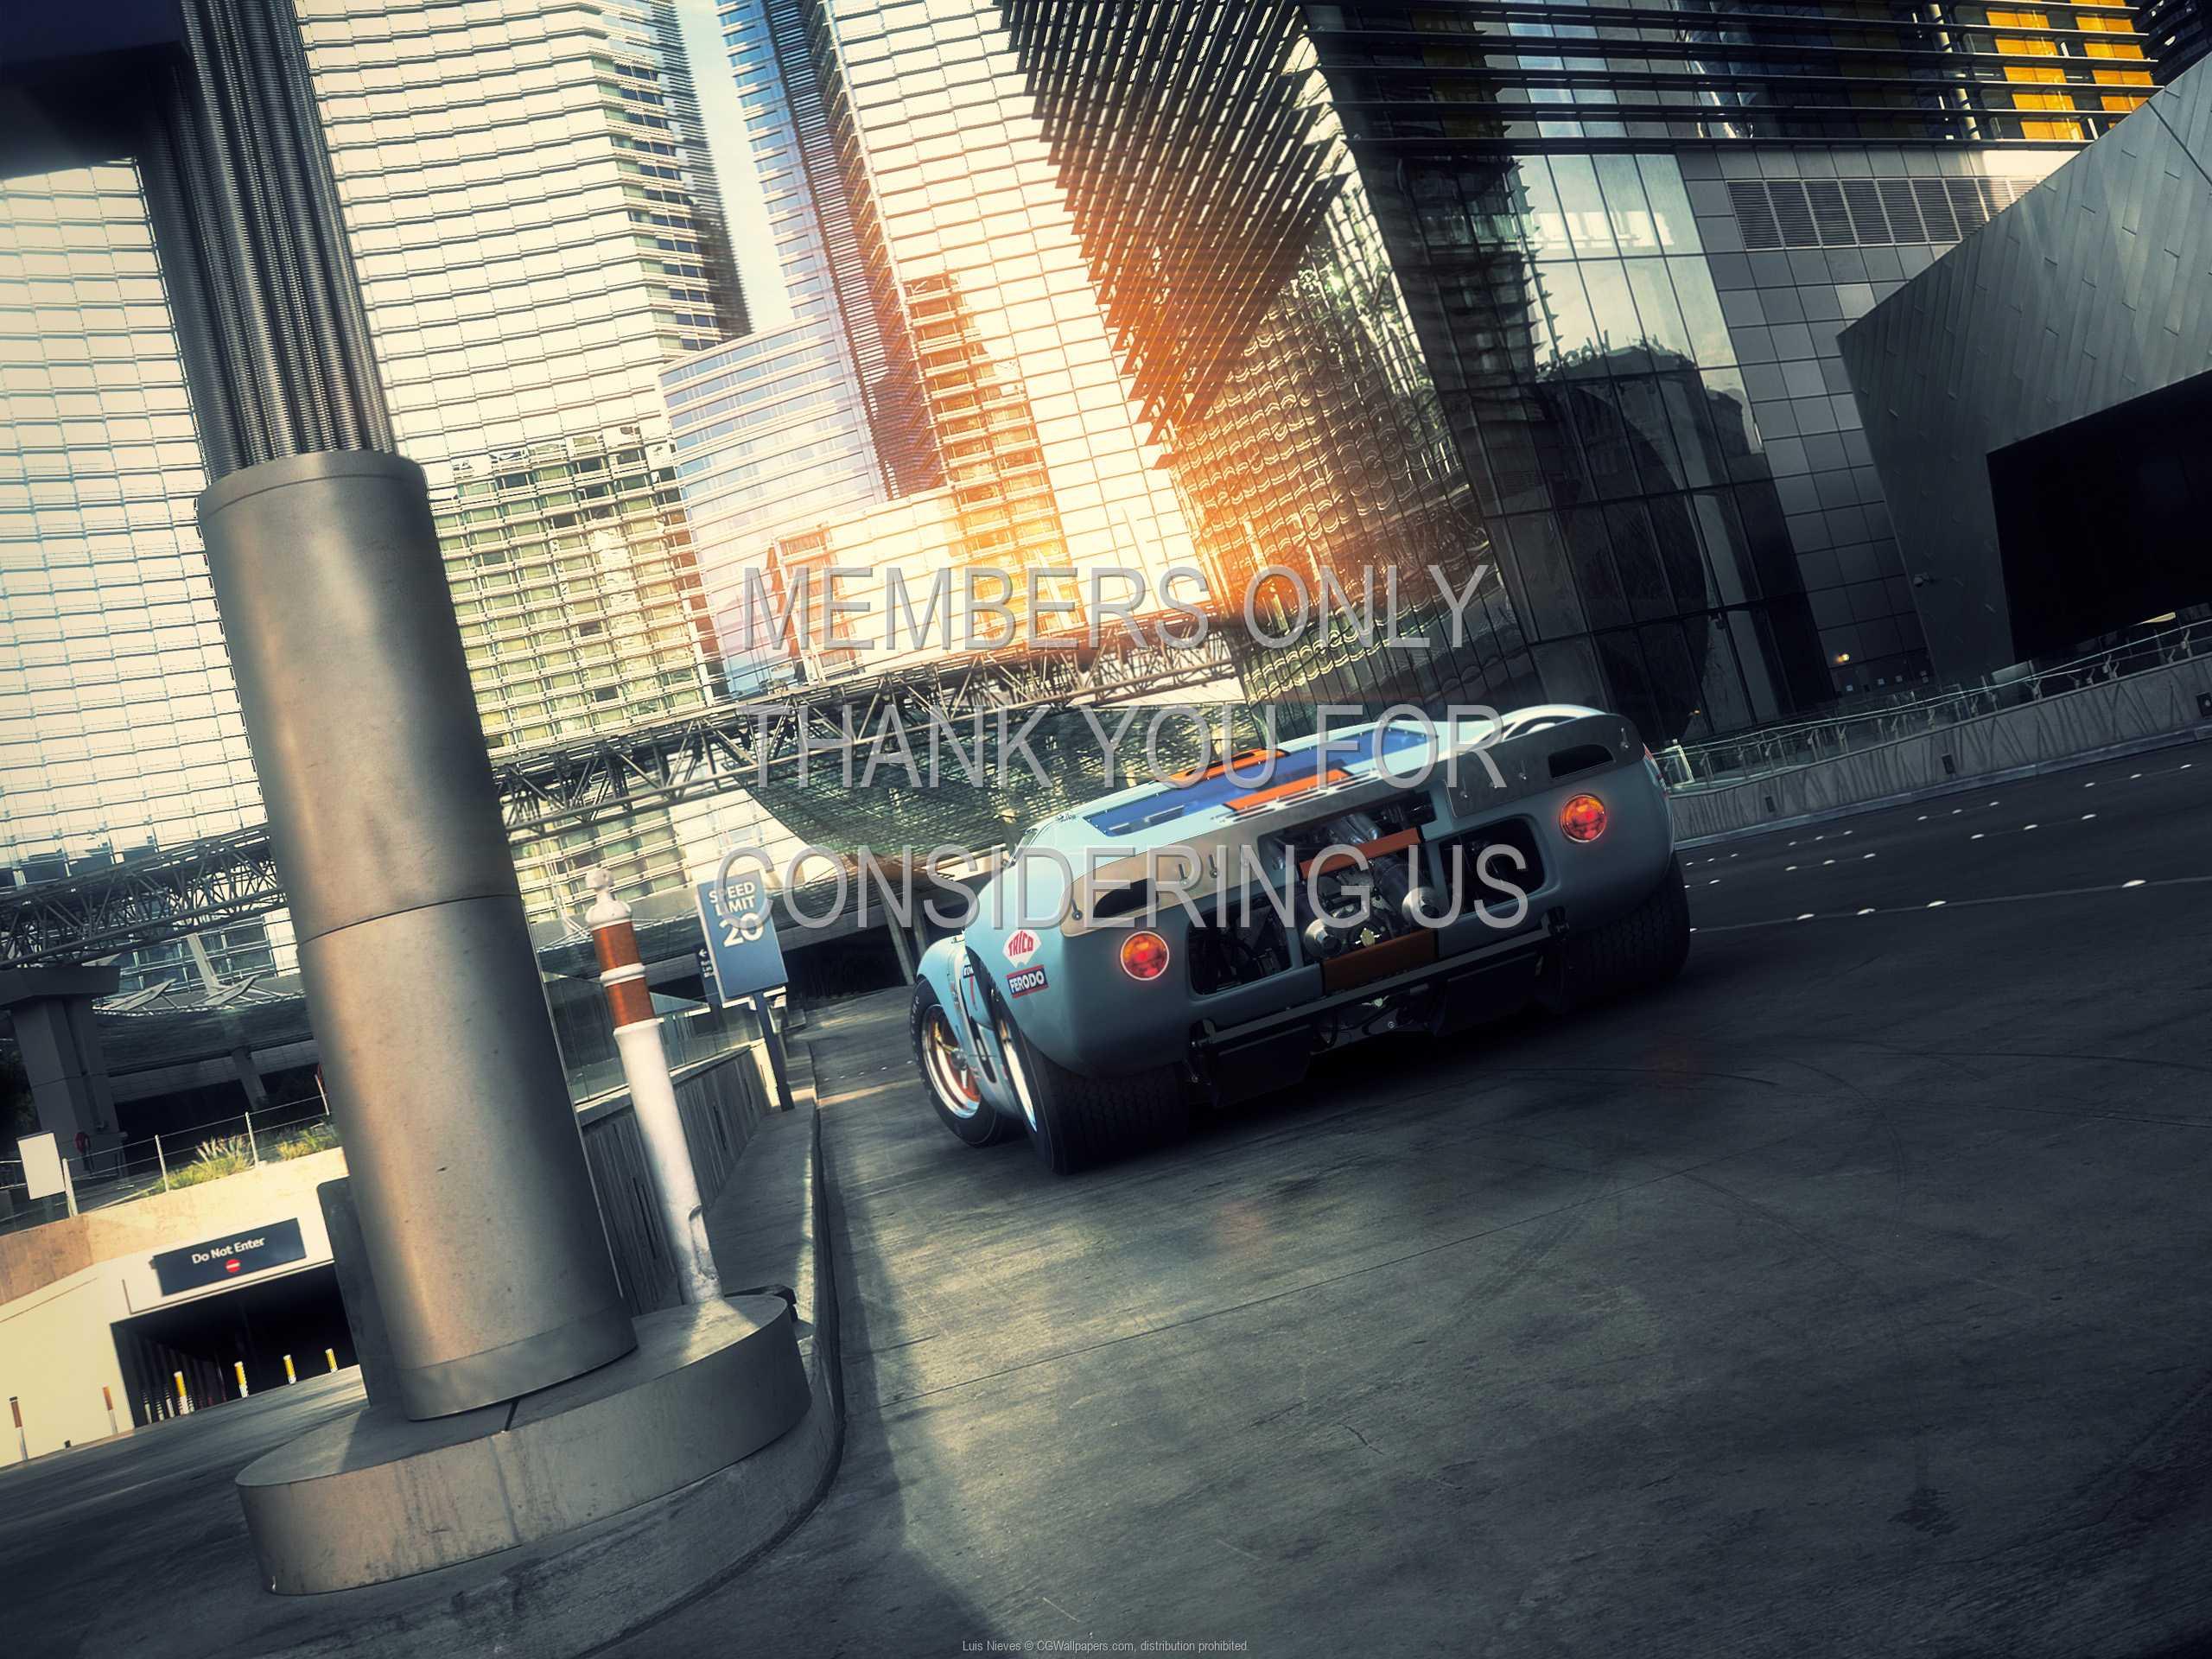 Luis Nieves 1080p Horizontal Mobile wallpaper or background 01